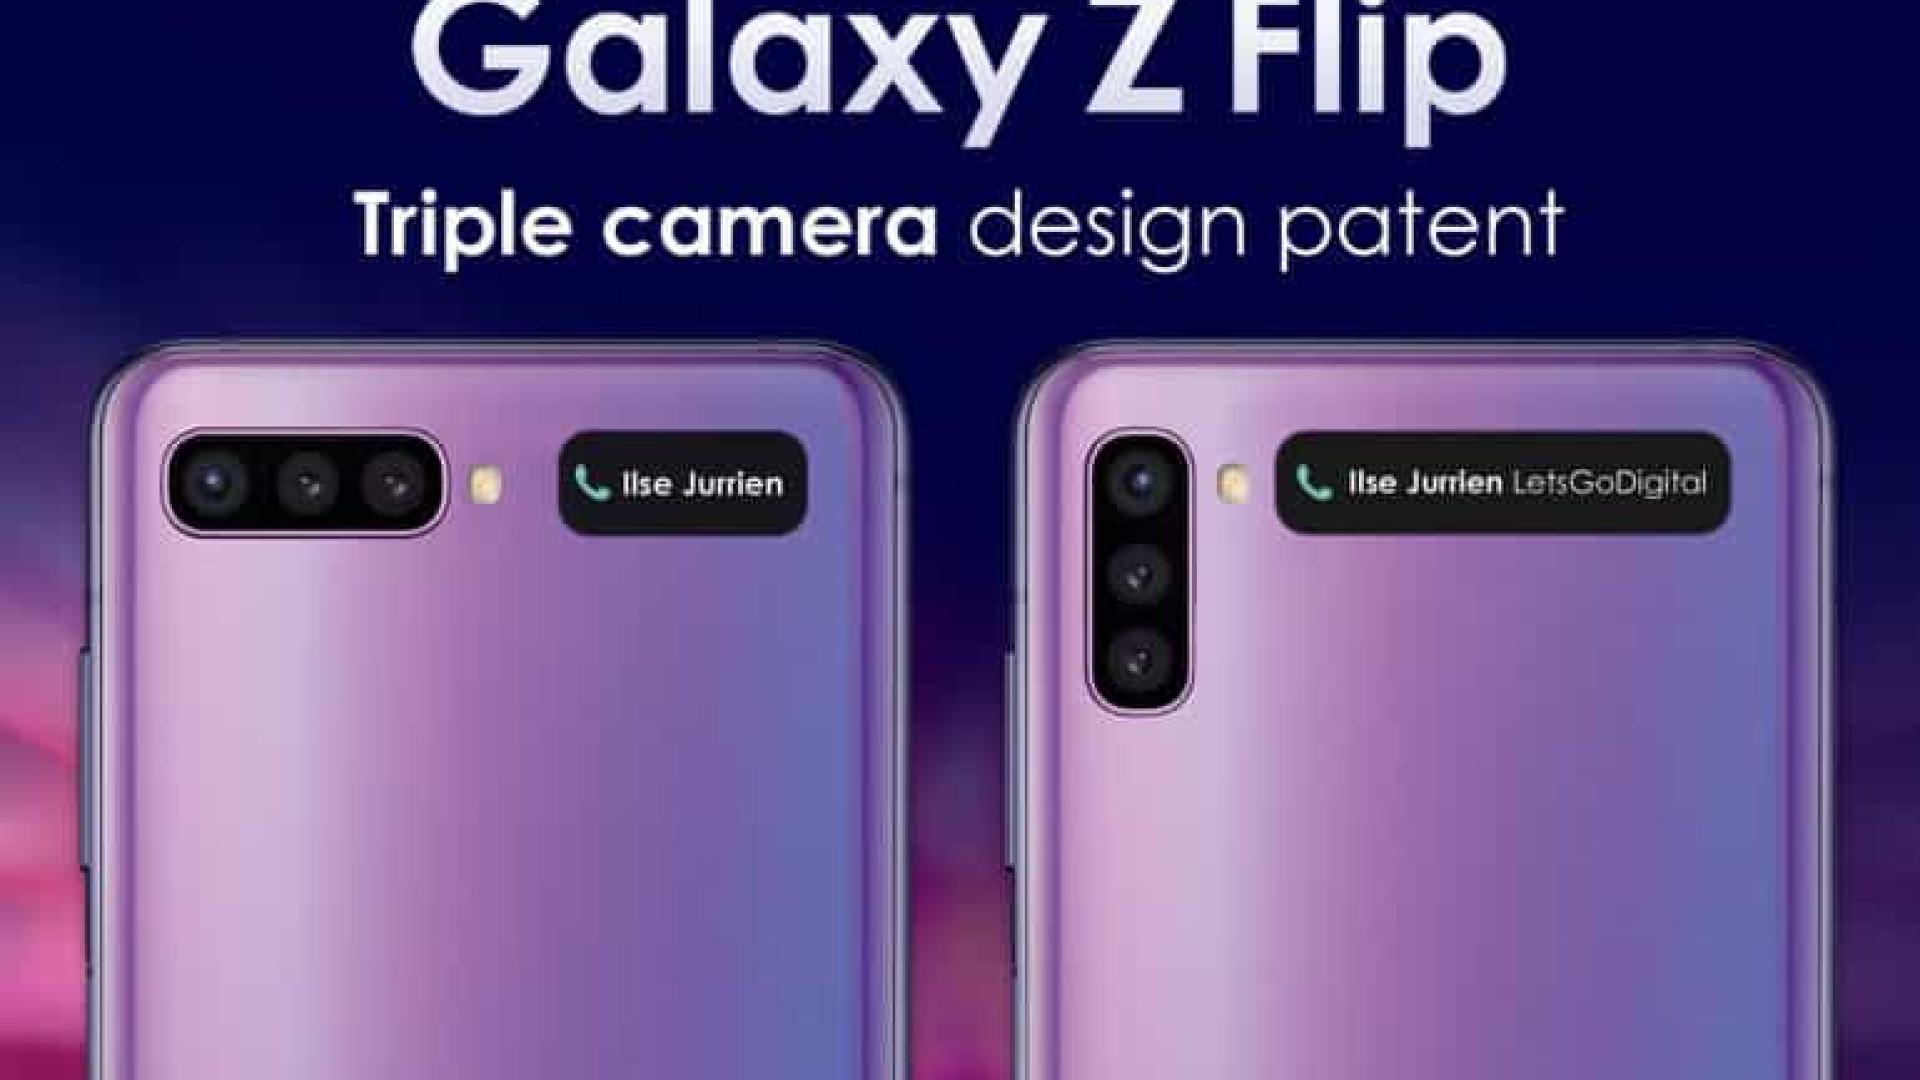 Novo smartphone dobrável da Samsung terá câmera tripla